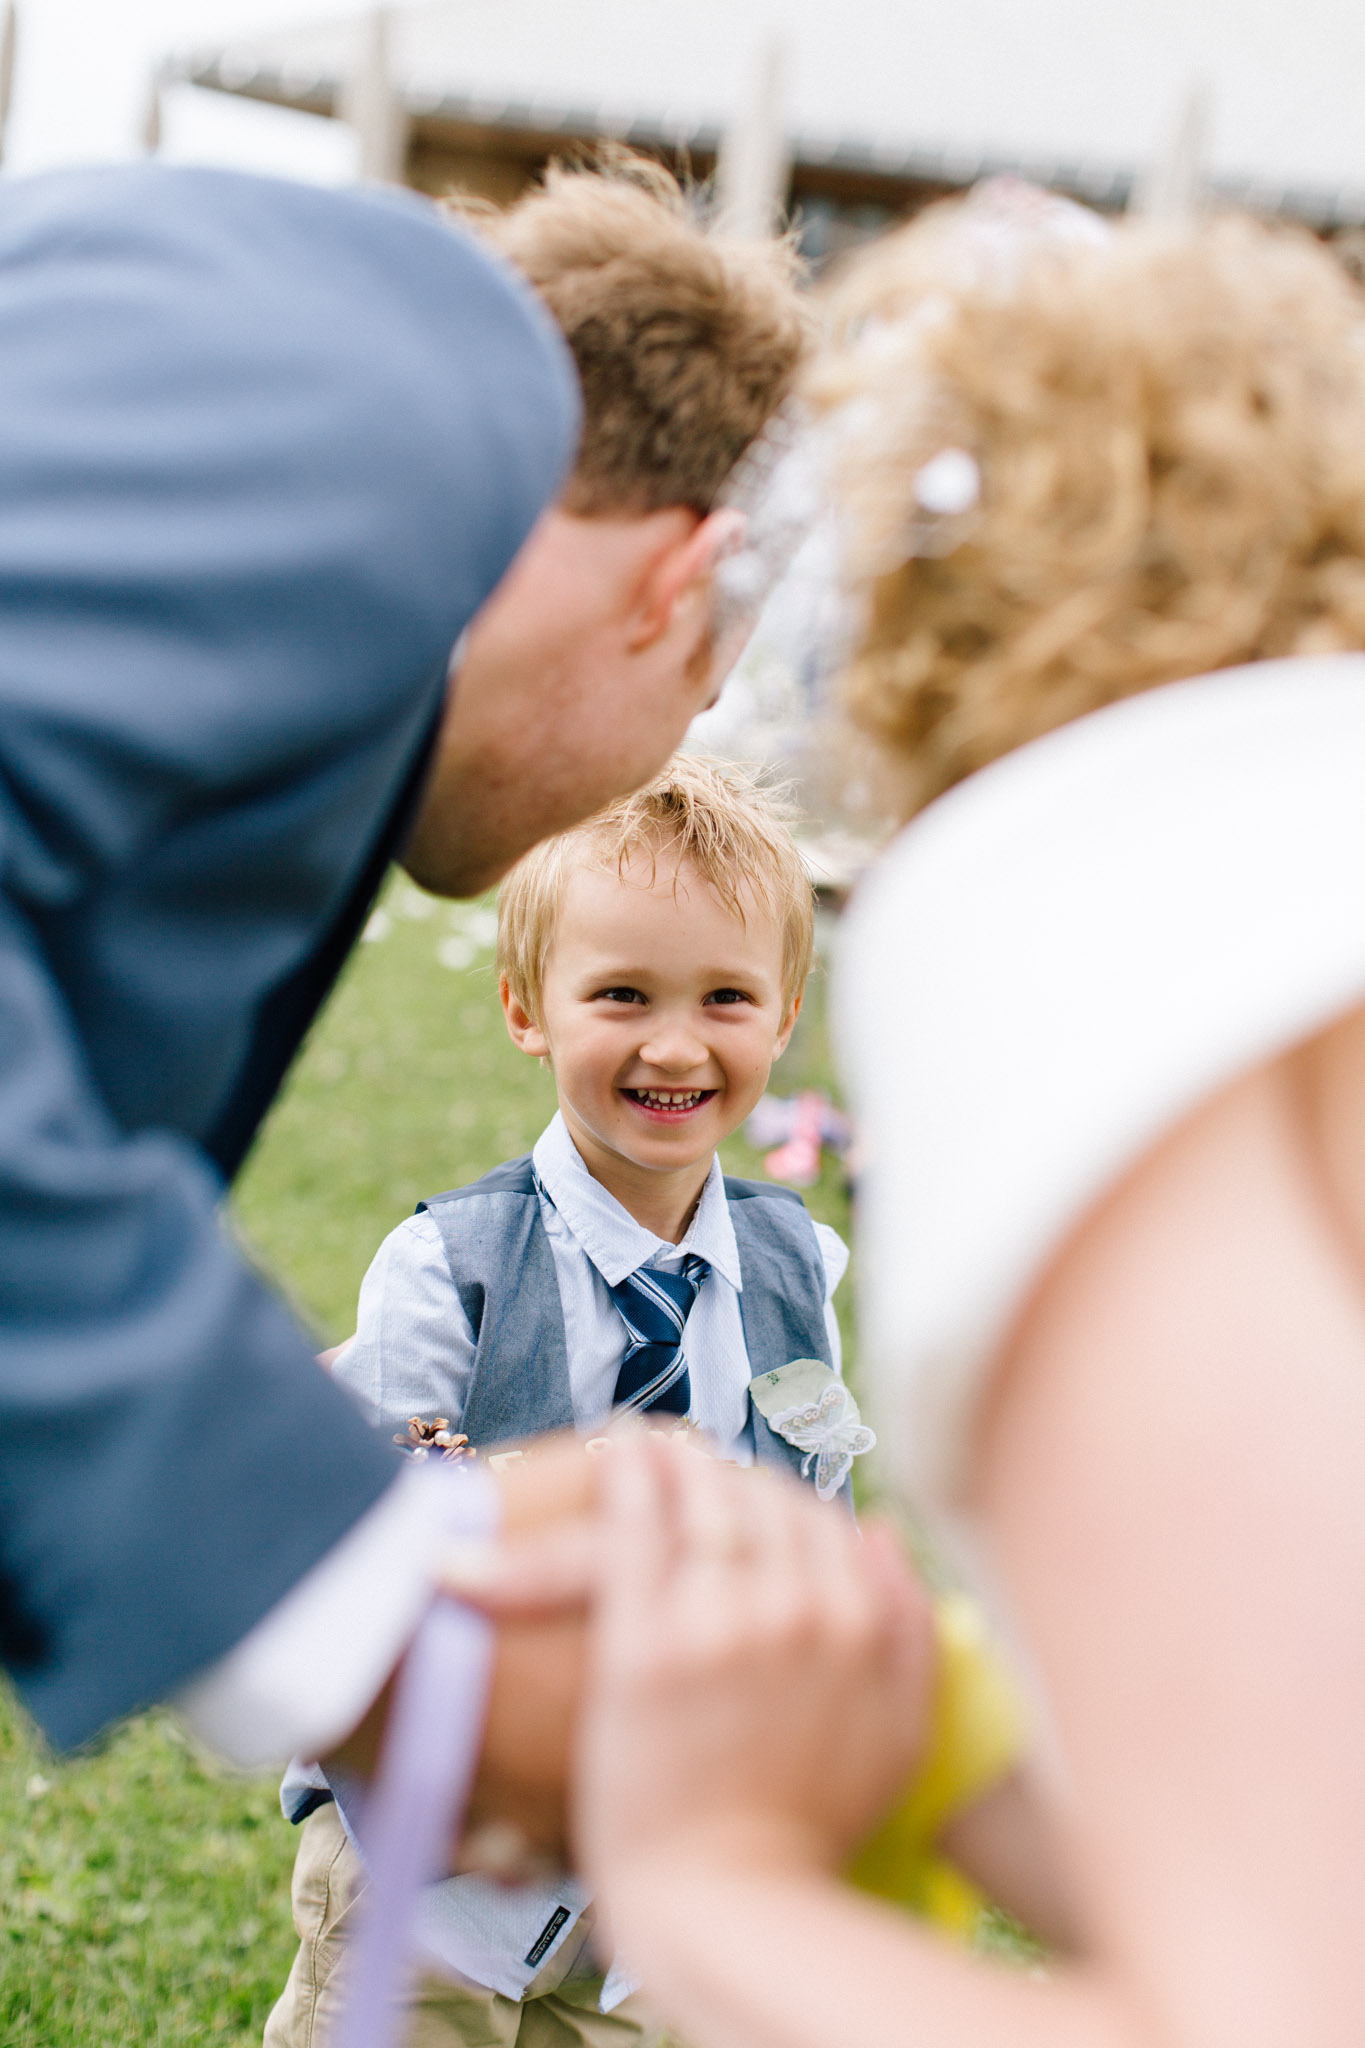 Lenl-Simmental-Buehlerhof-Pia-Anna-Christian-Wedding-Photography-EK-75.jpg